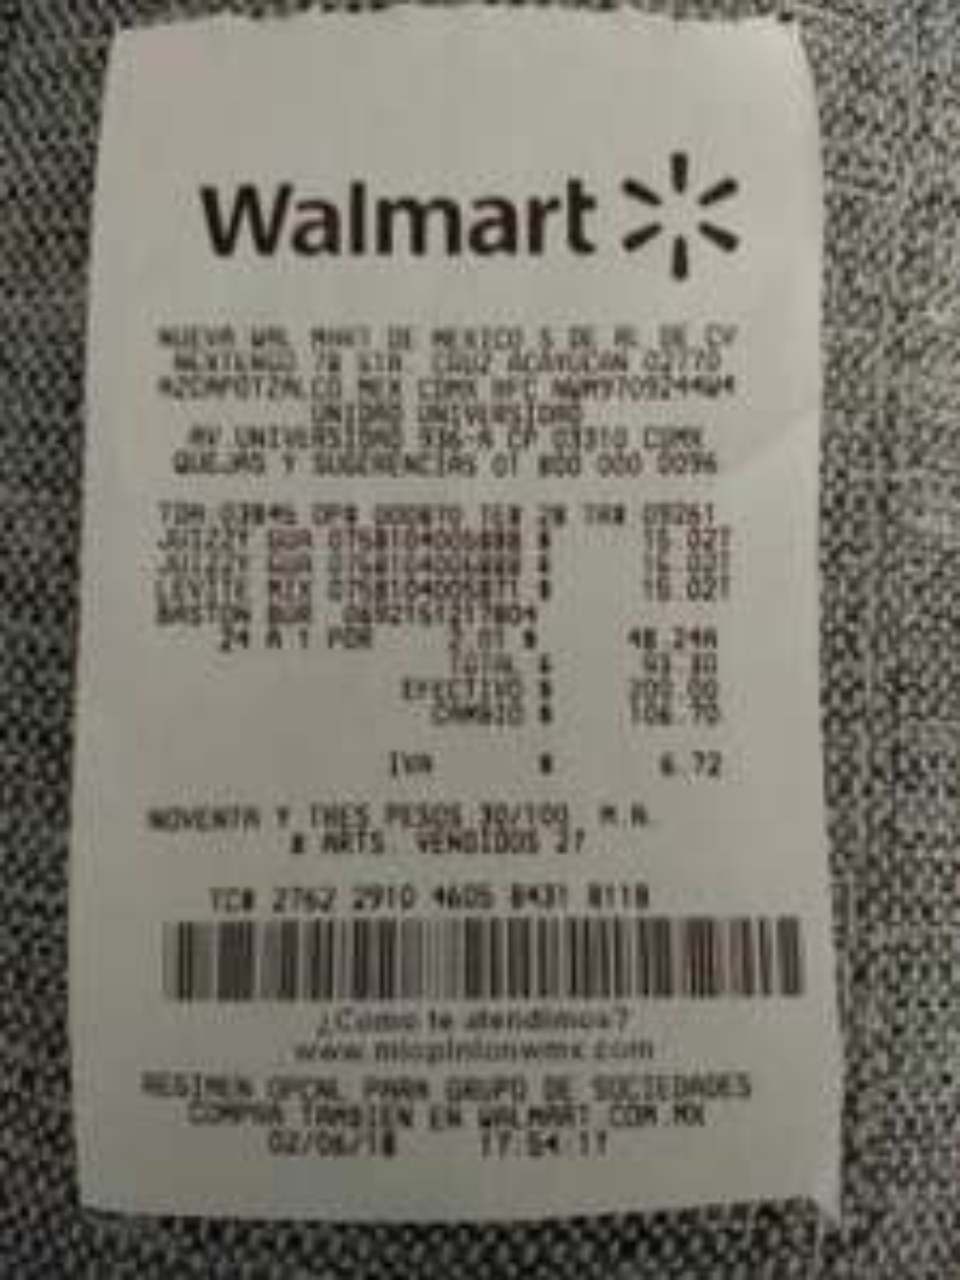 Walmart: Burbujero